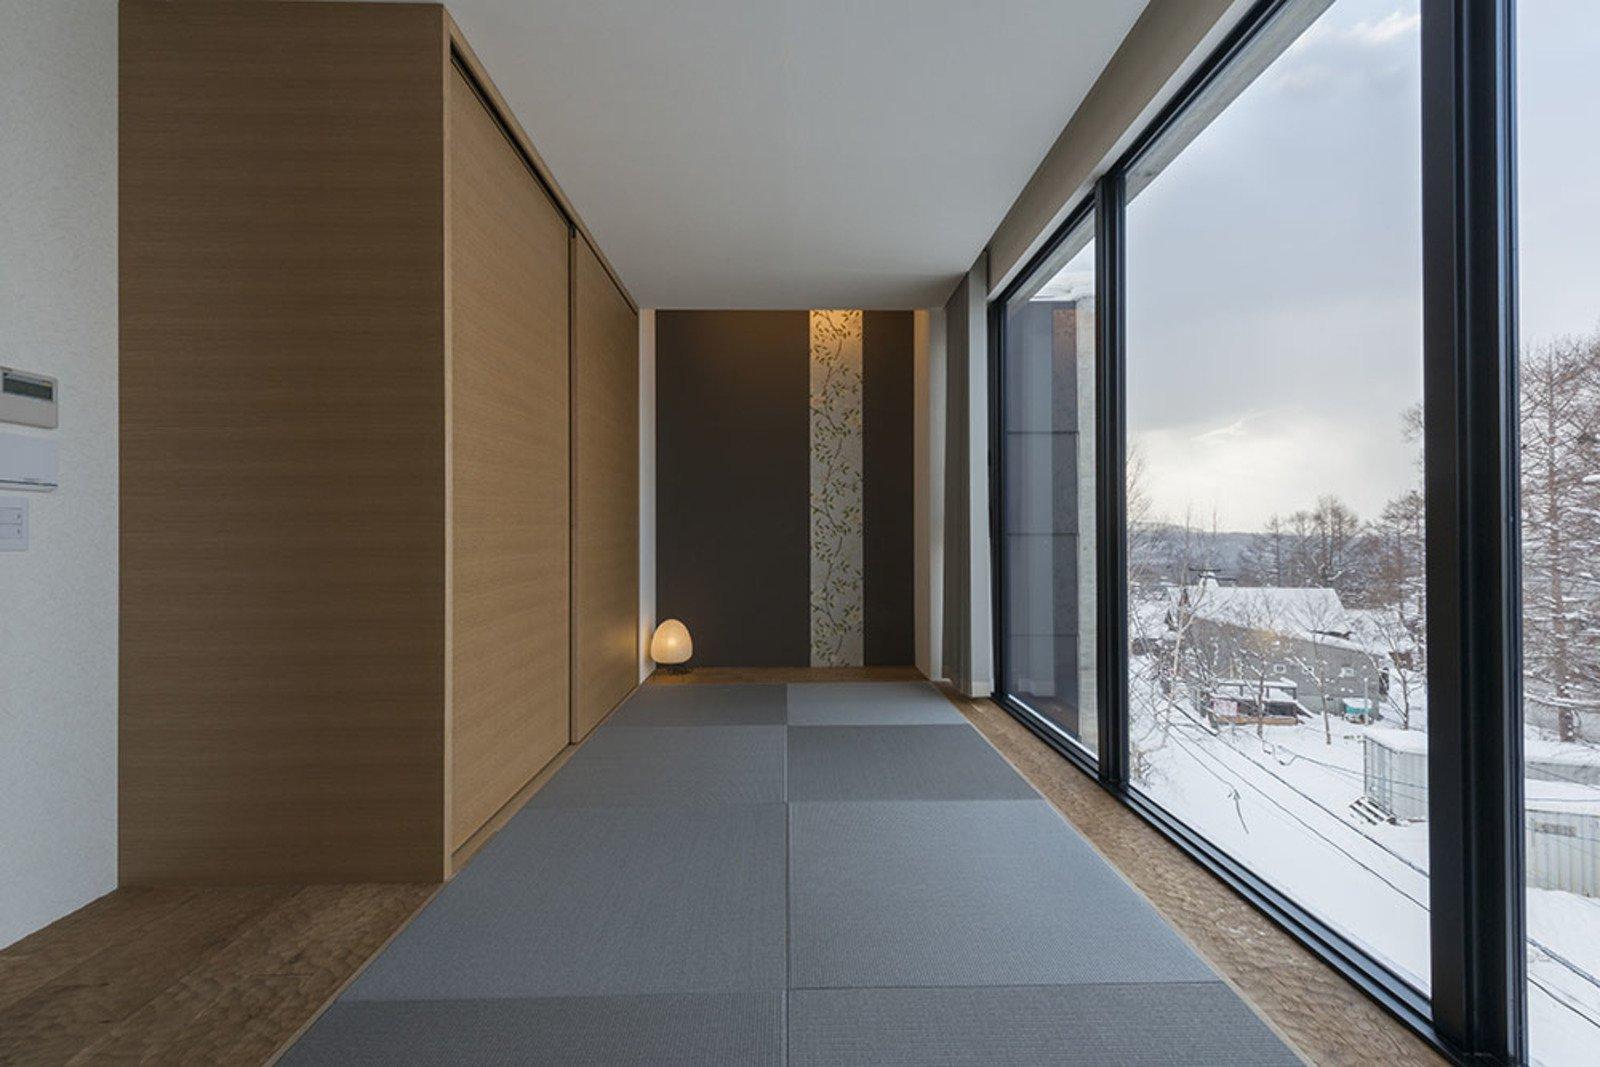 Penthouse tatami room large